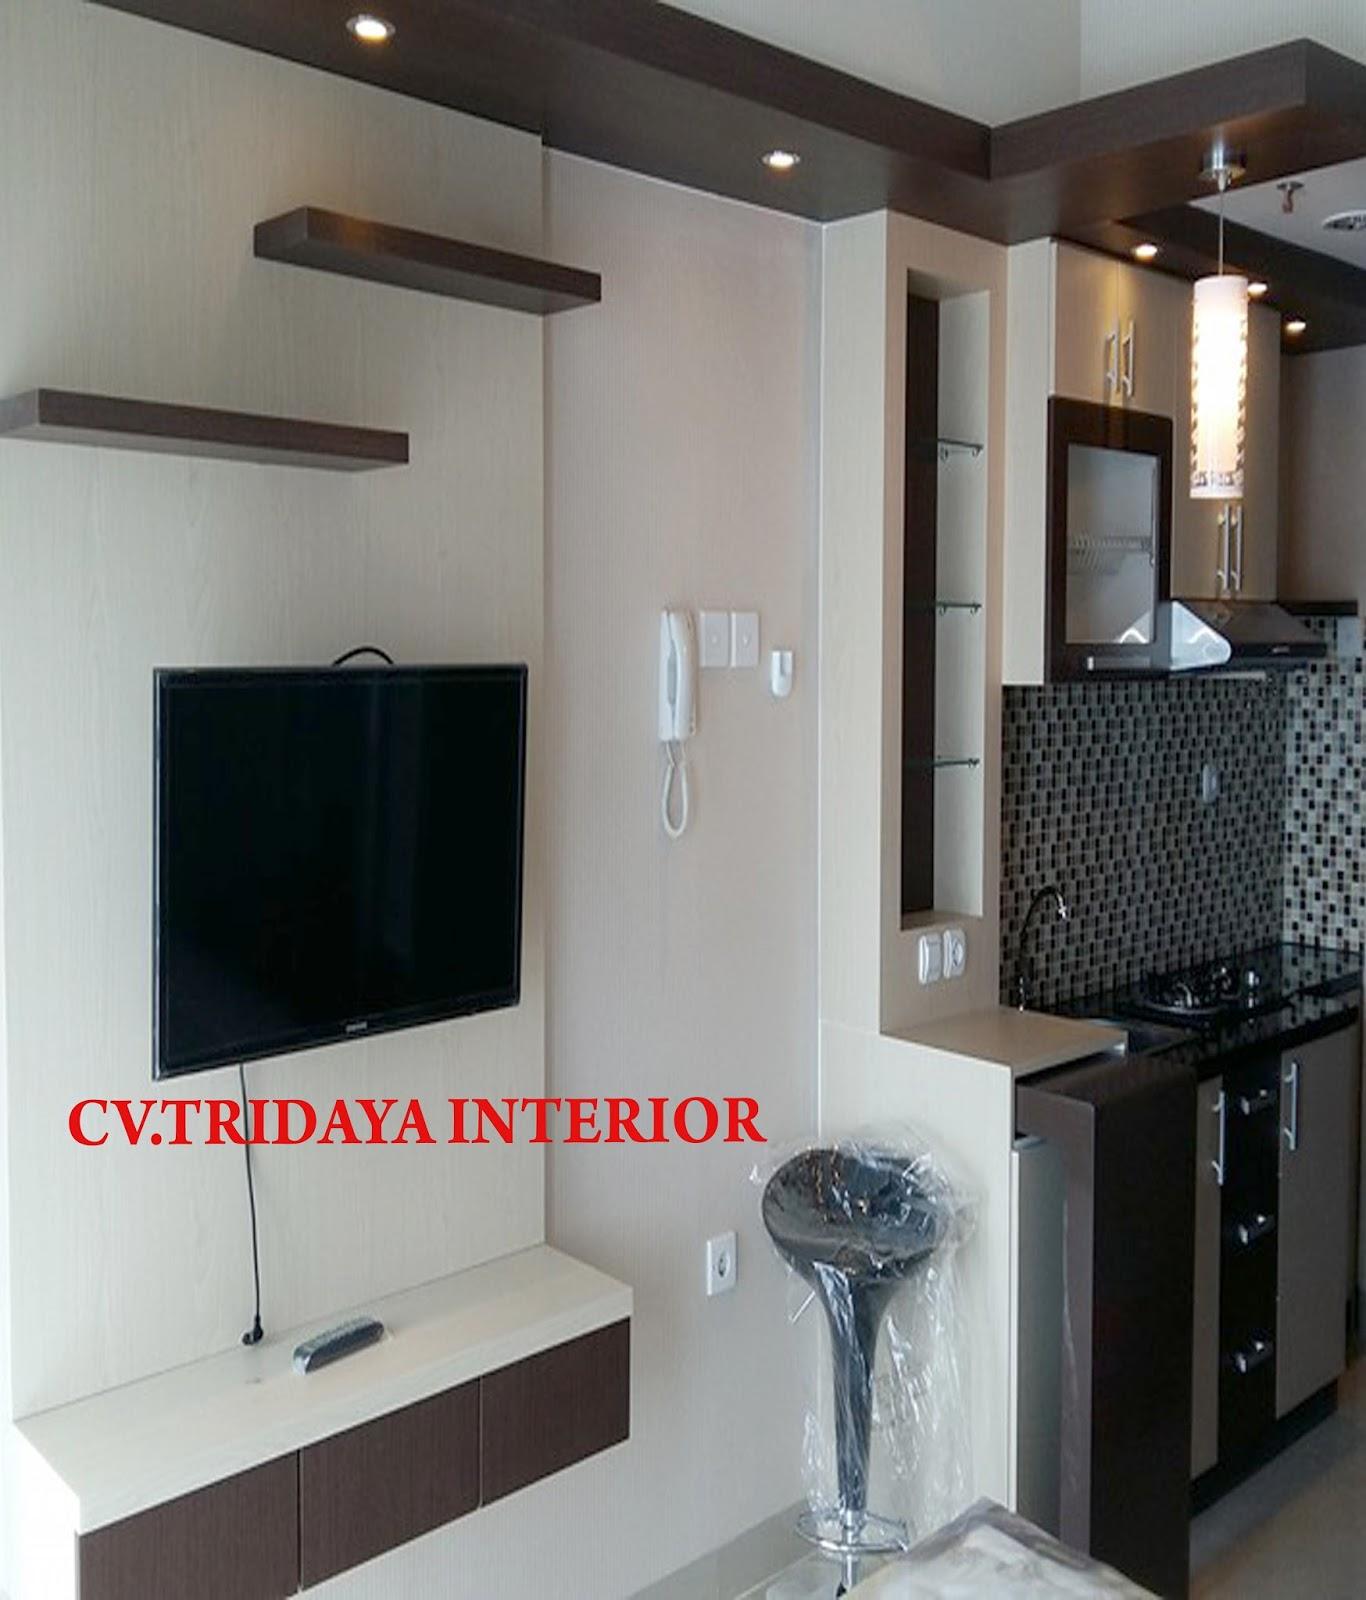 Cv Tridaya Interior Paket Apartement Studio Murah Design